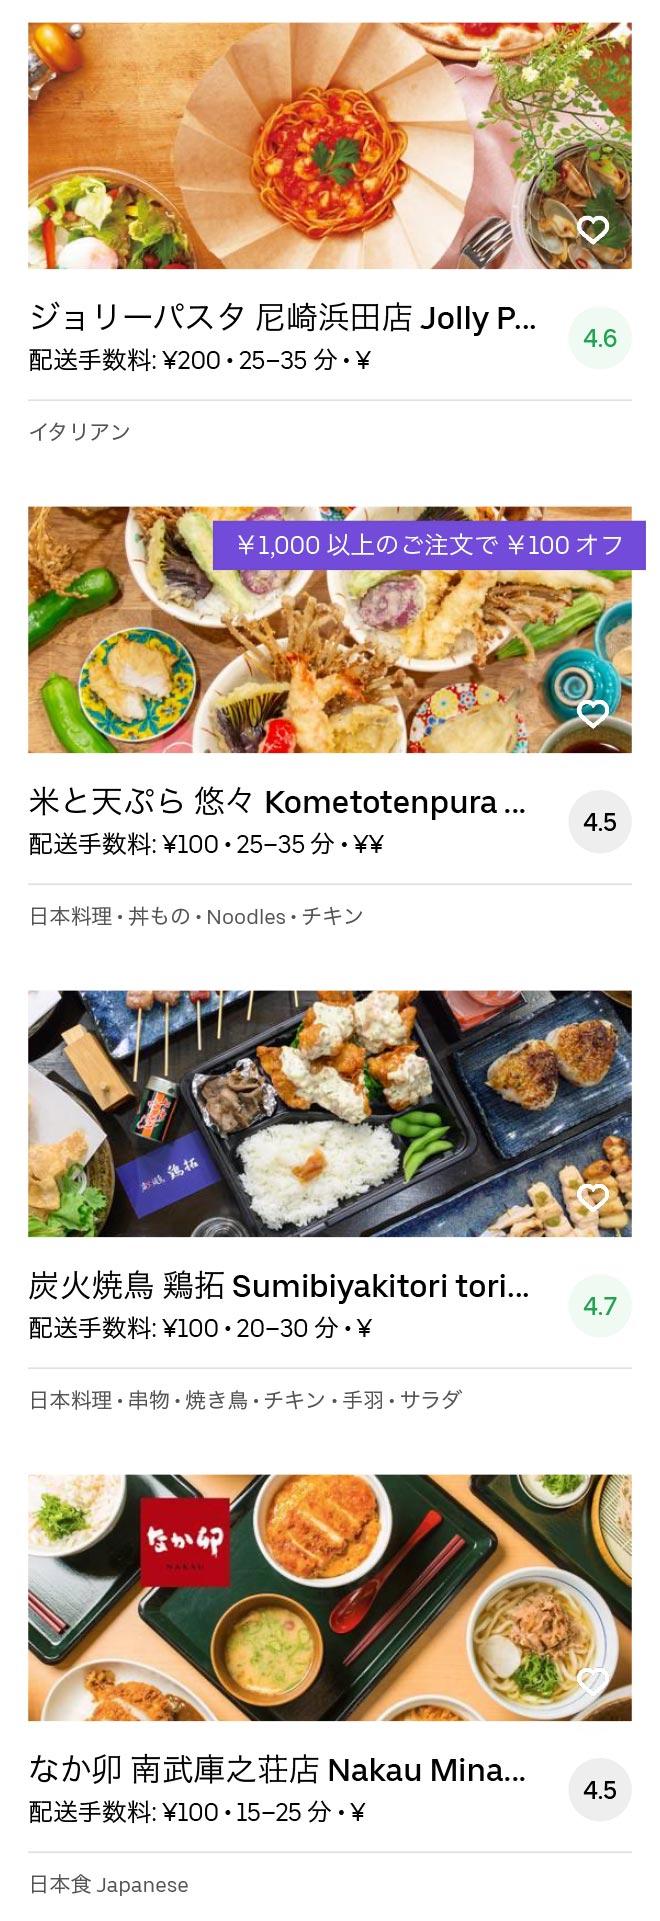 Amagasaki mukonosou menu 2005 10